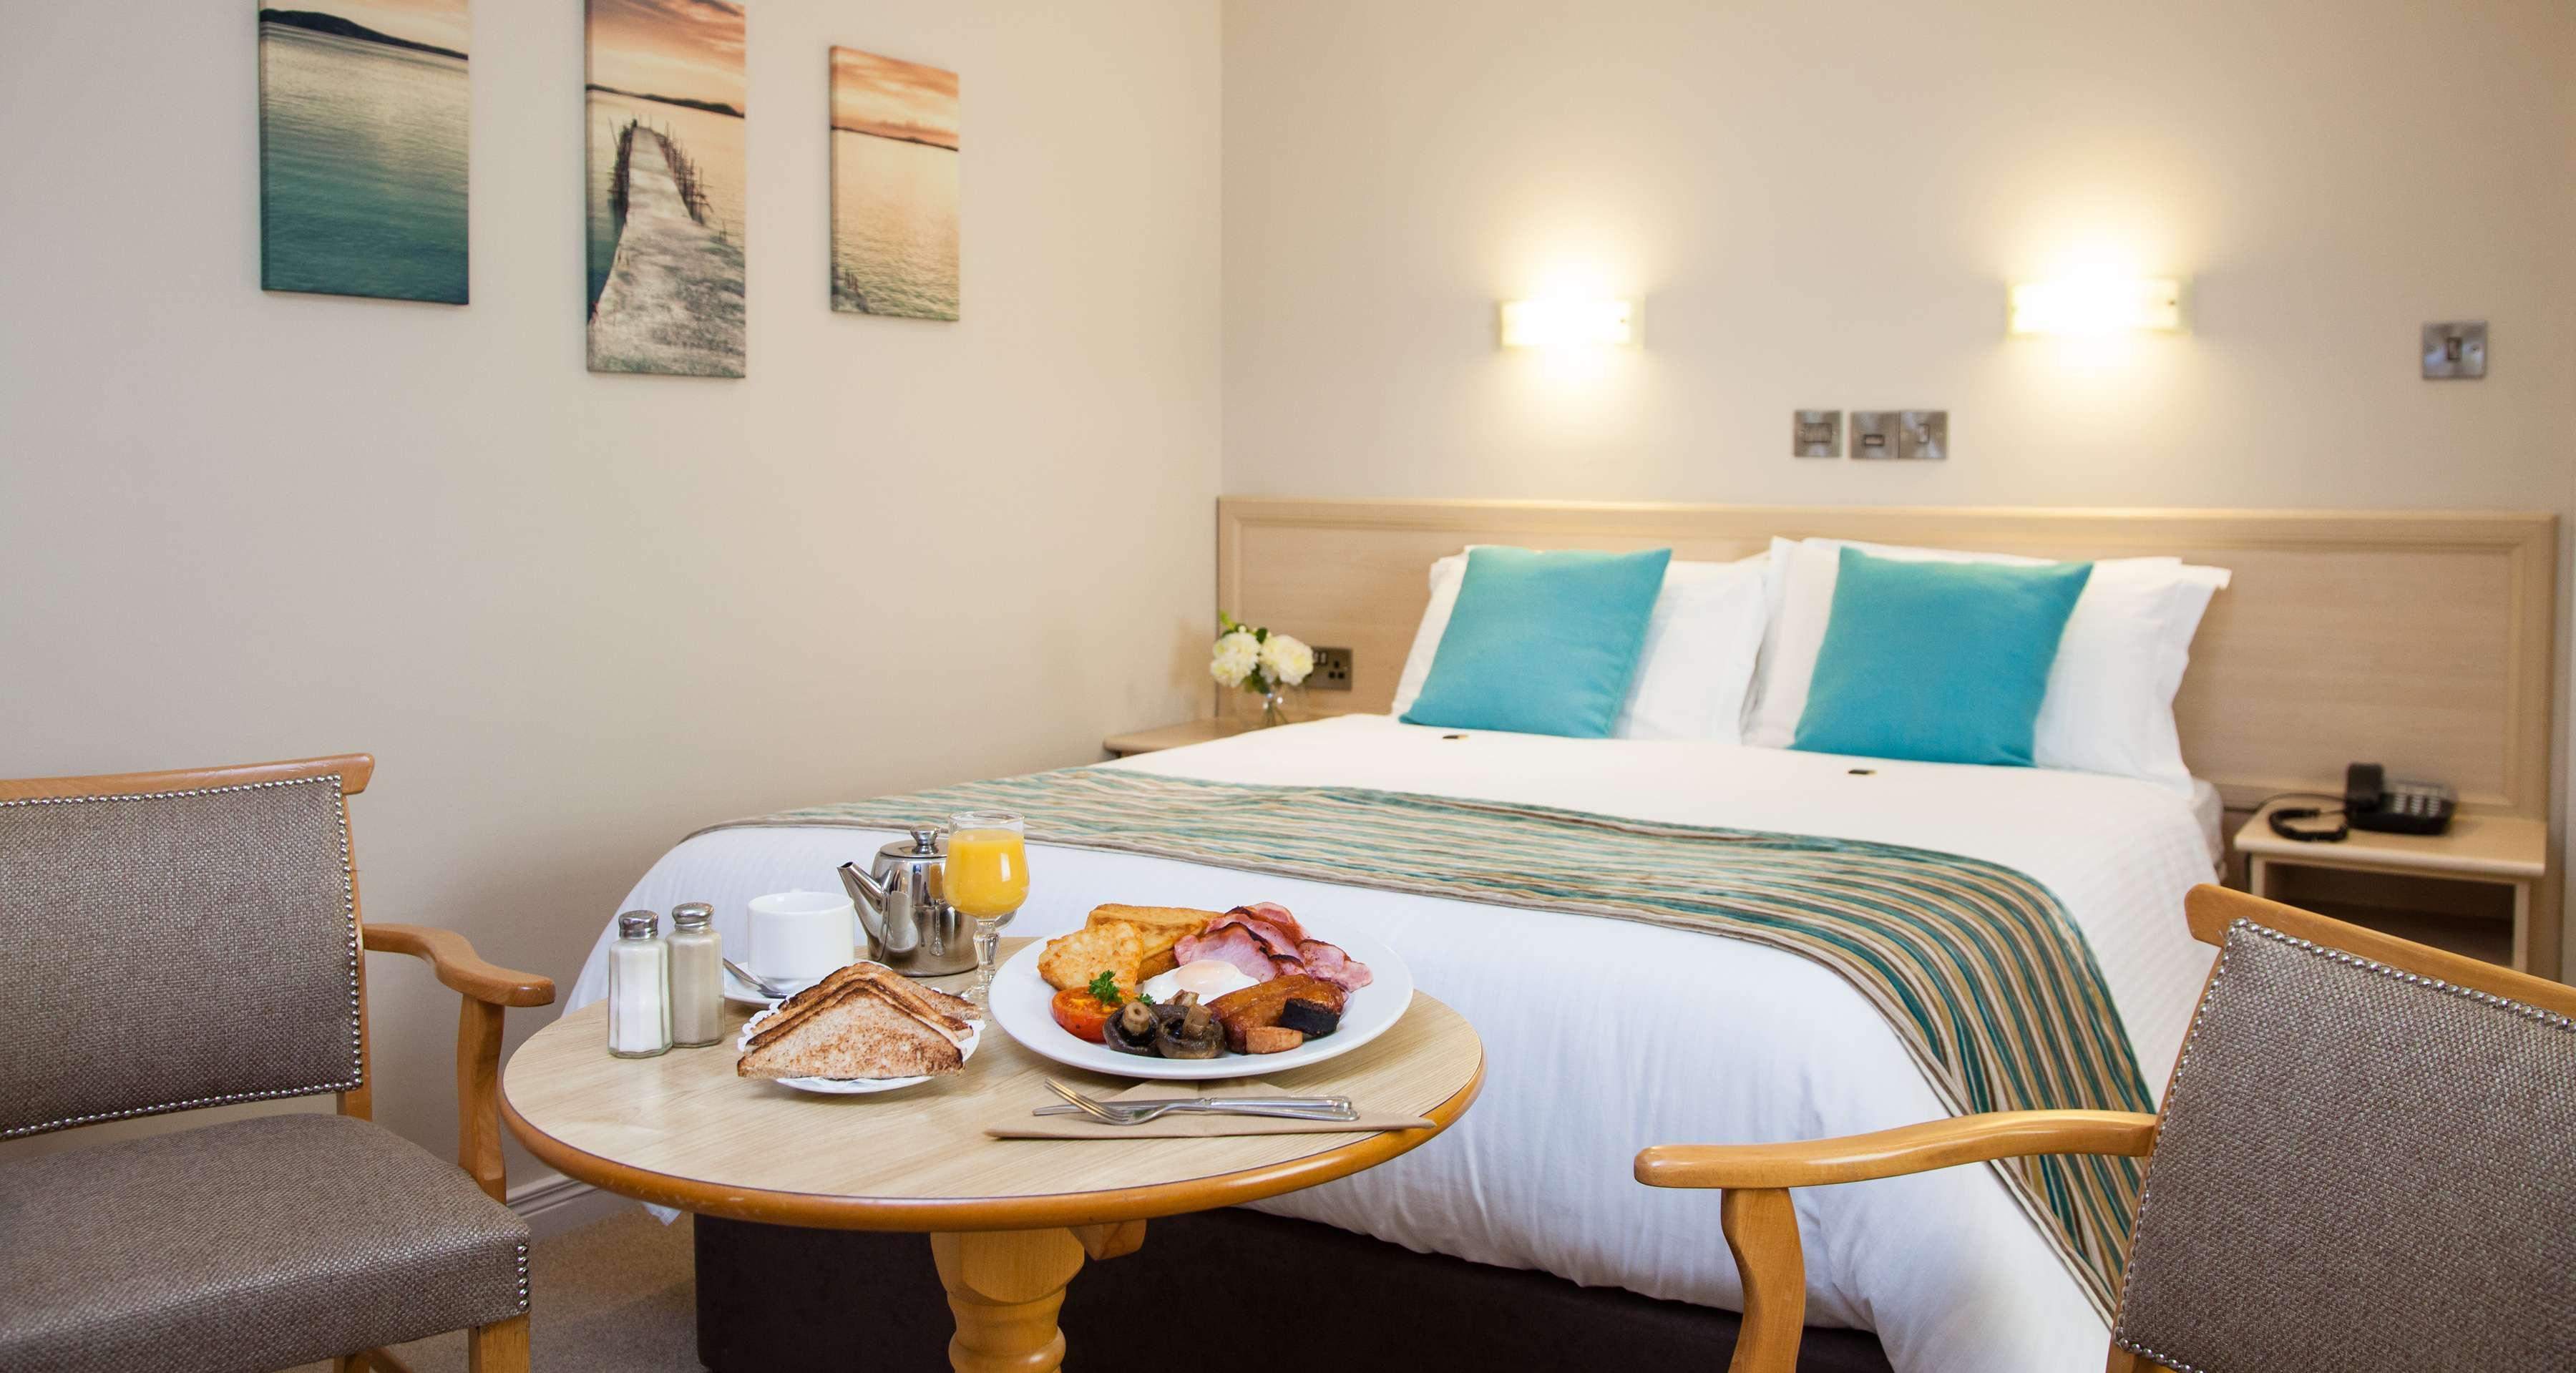 Bed and Breakfast Coleraine